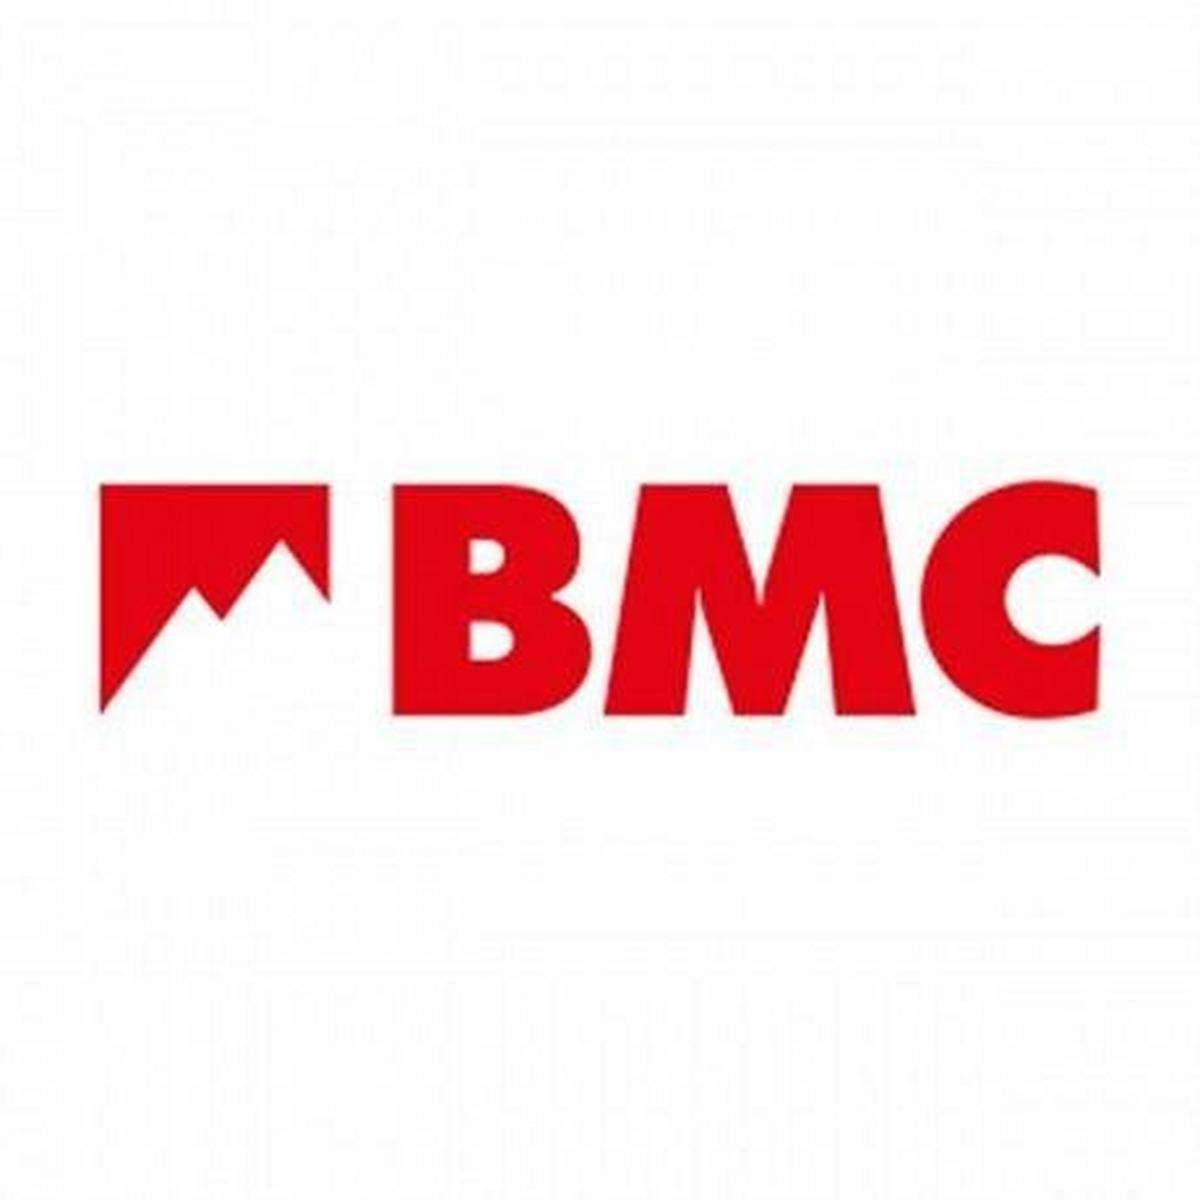 Cordee BMC Climbing Guide Book: Froggatt to Black Rocks